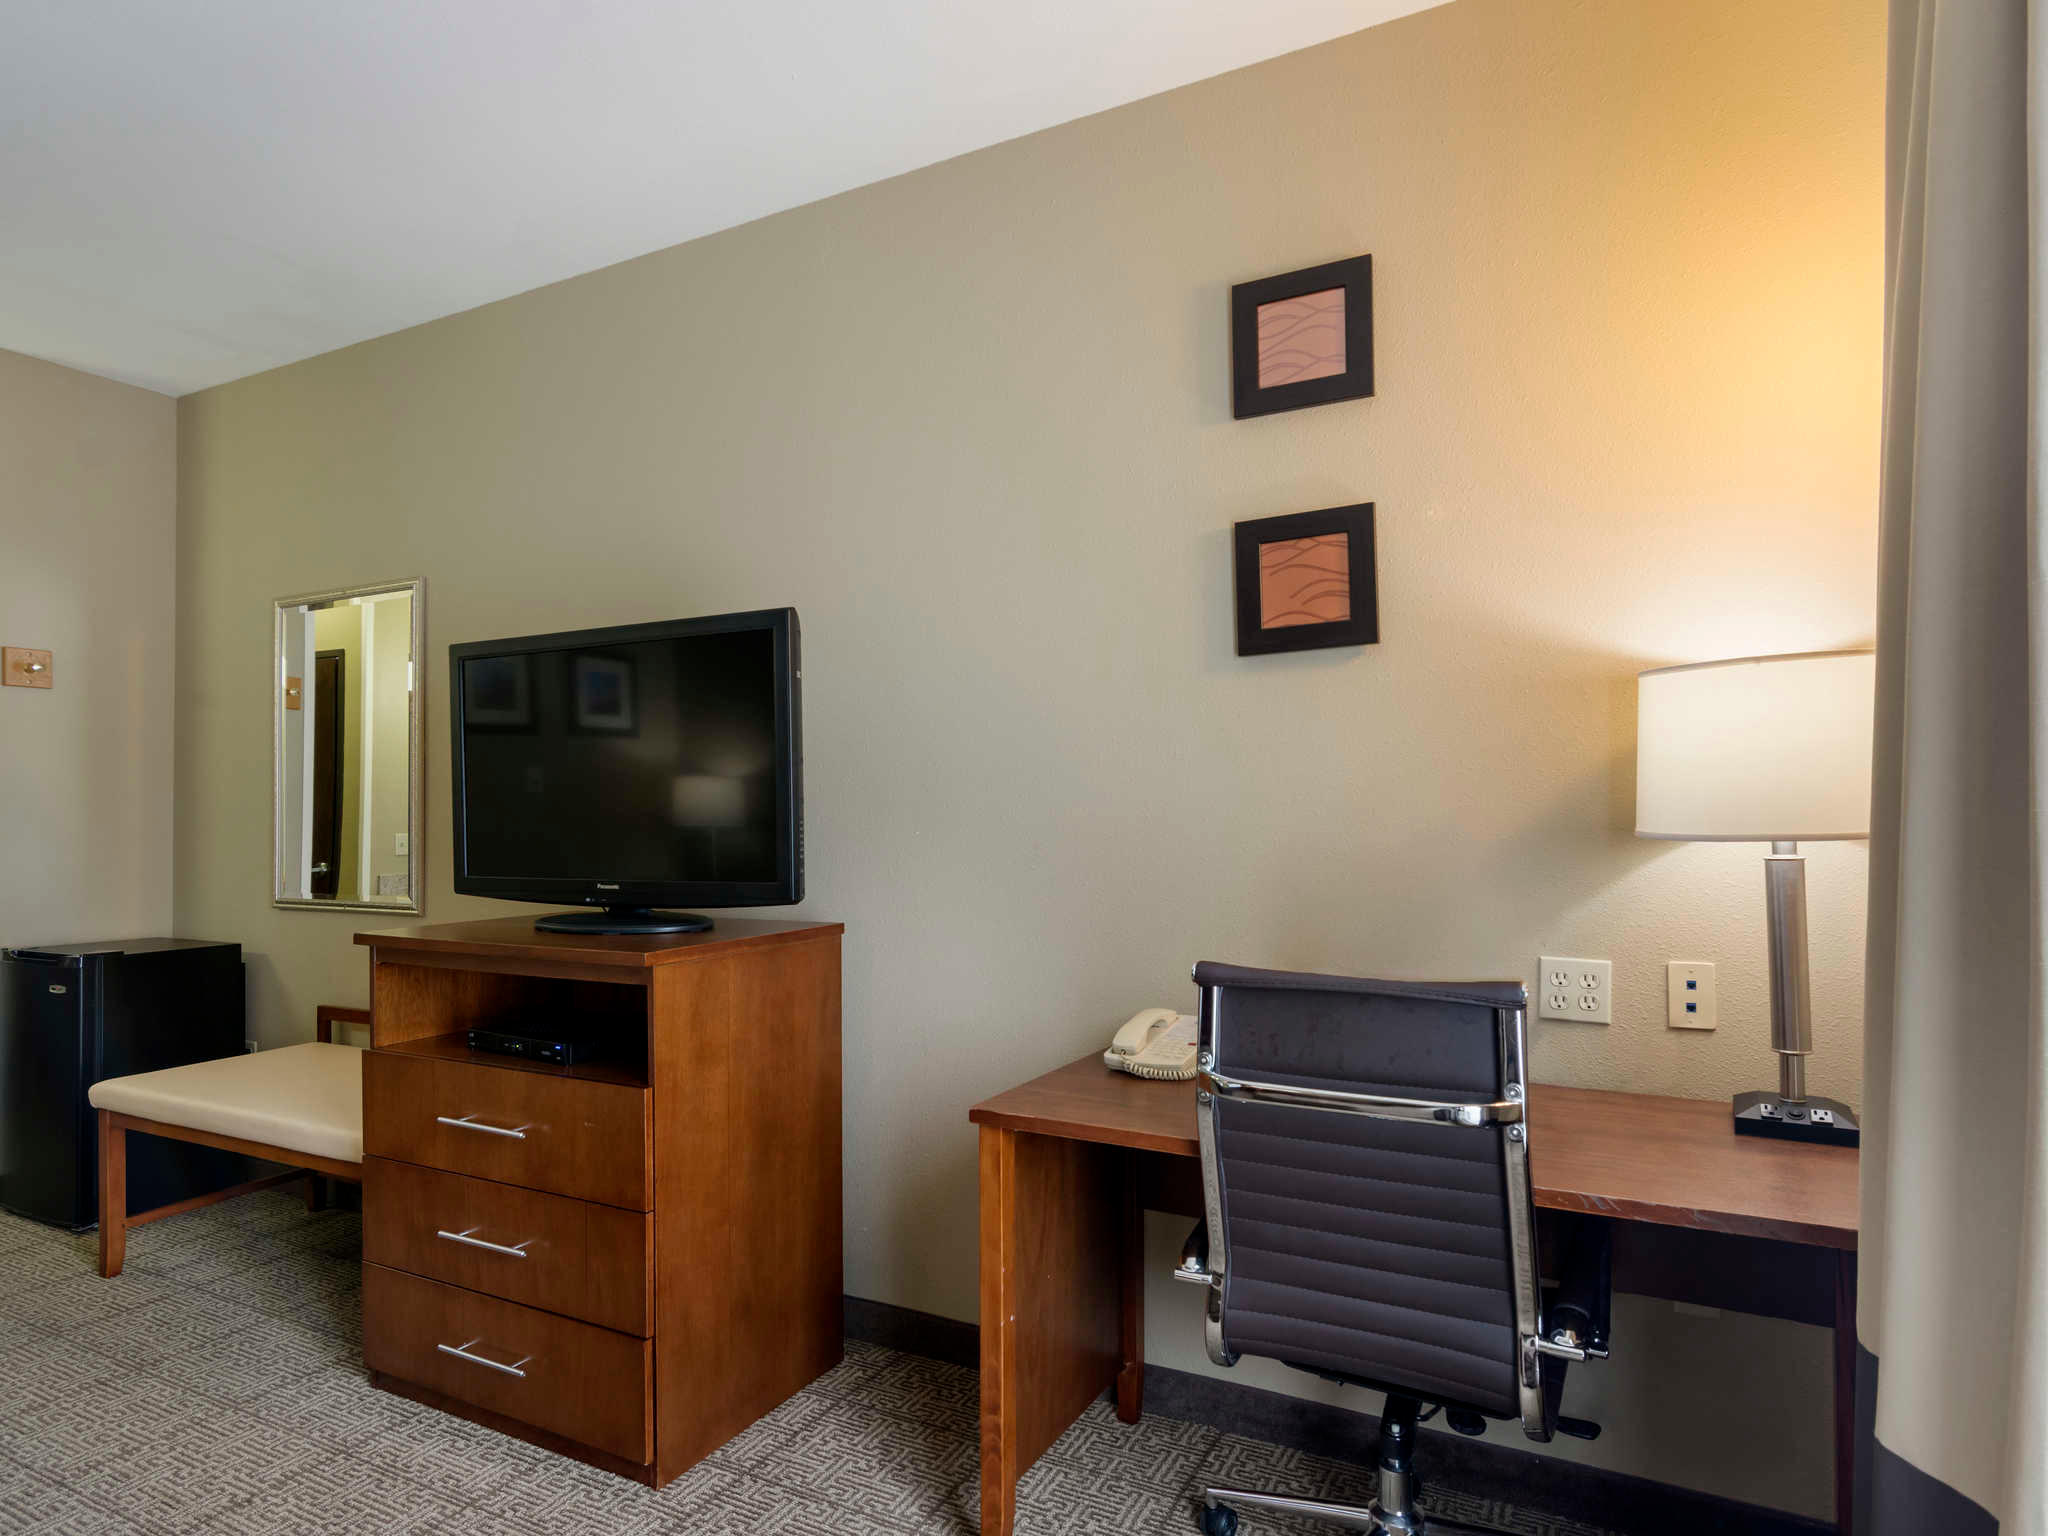 Comfort Inn & Suites Sacramento - University Area image 10